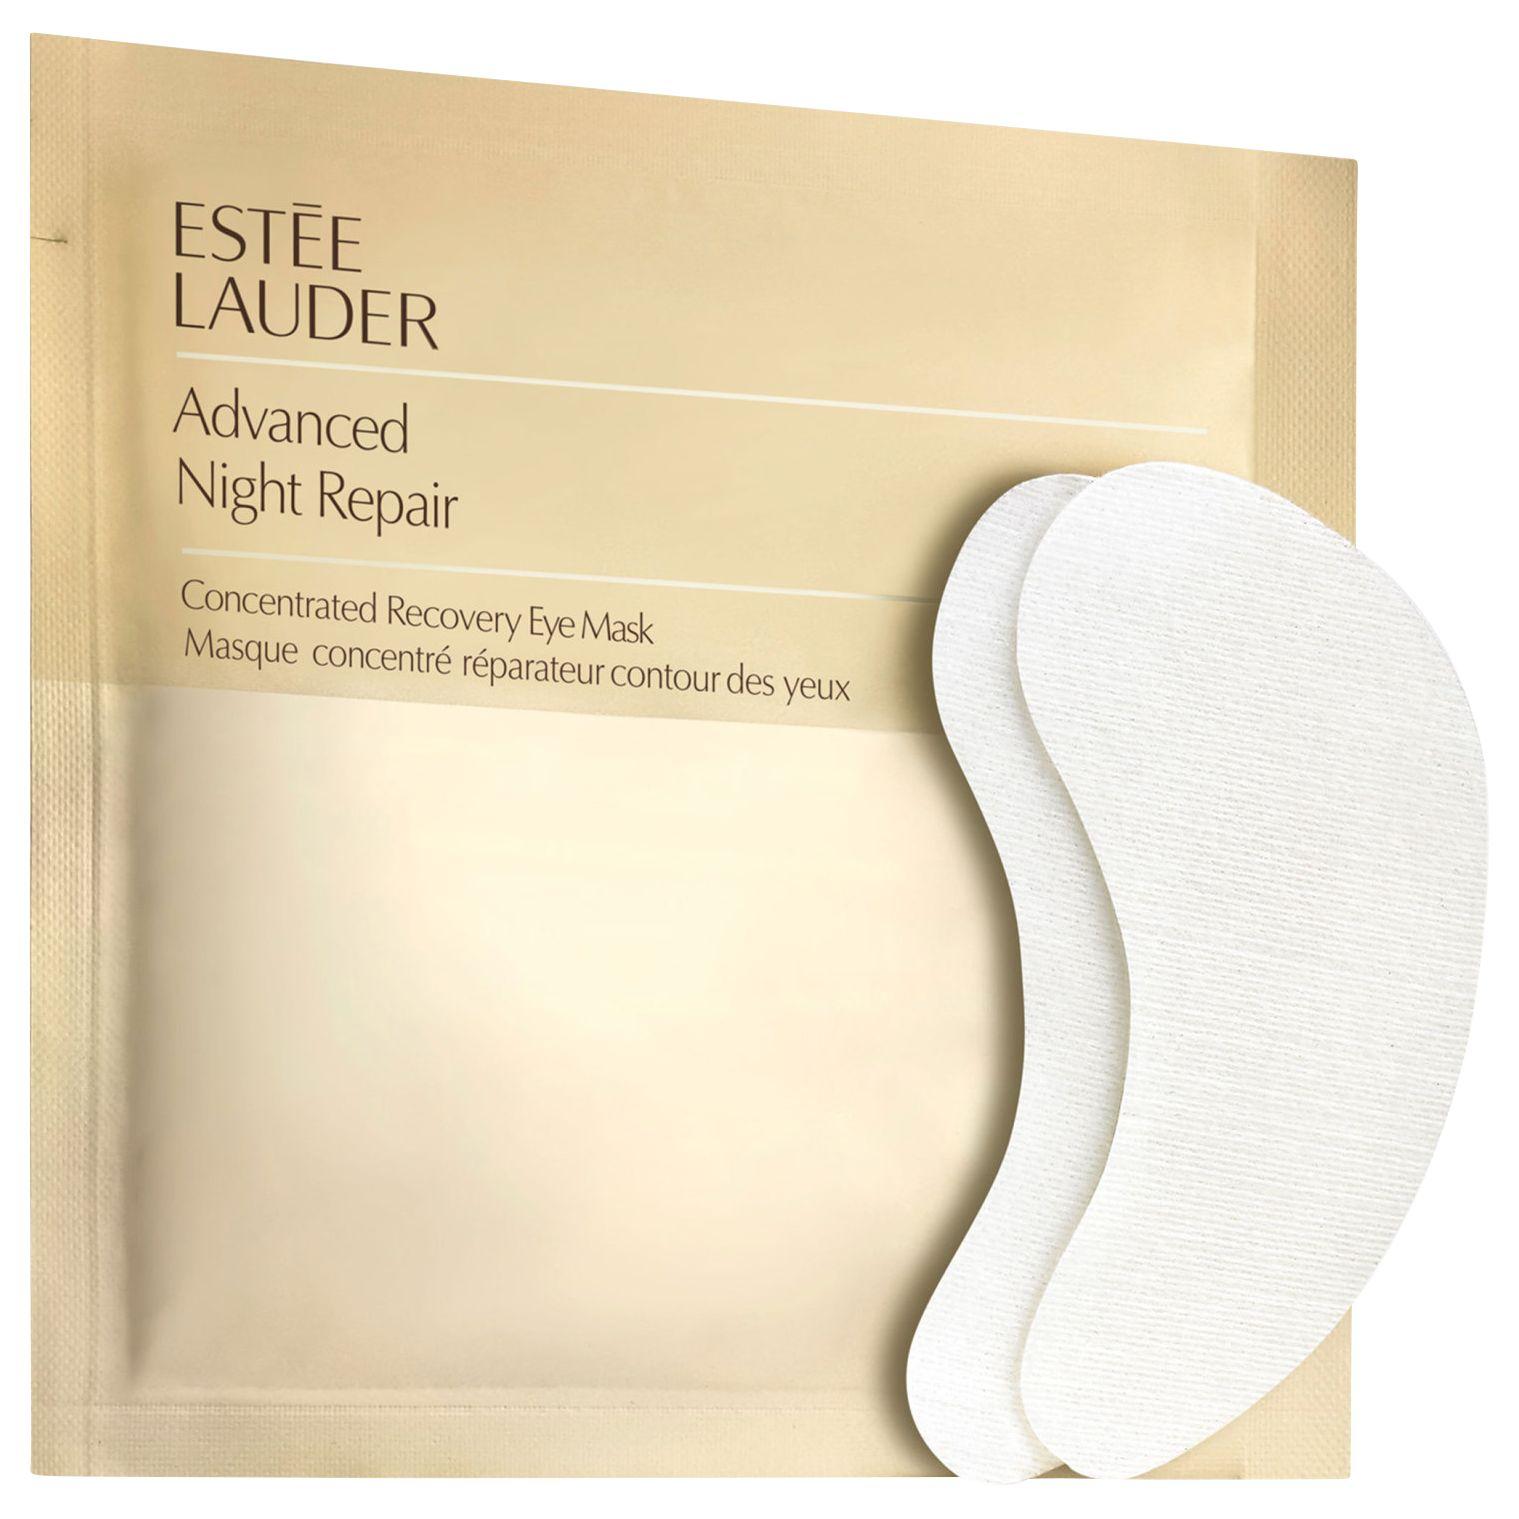 Estee Lauder Estée Lauder Advanced Night Repair Concentrated Recovery Eye Masks, x 4